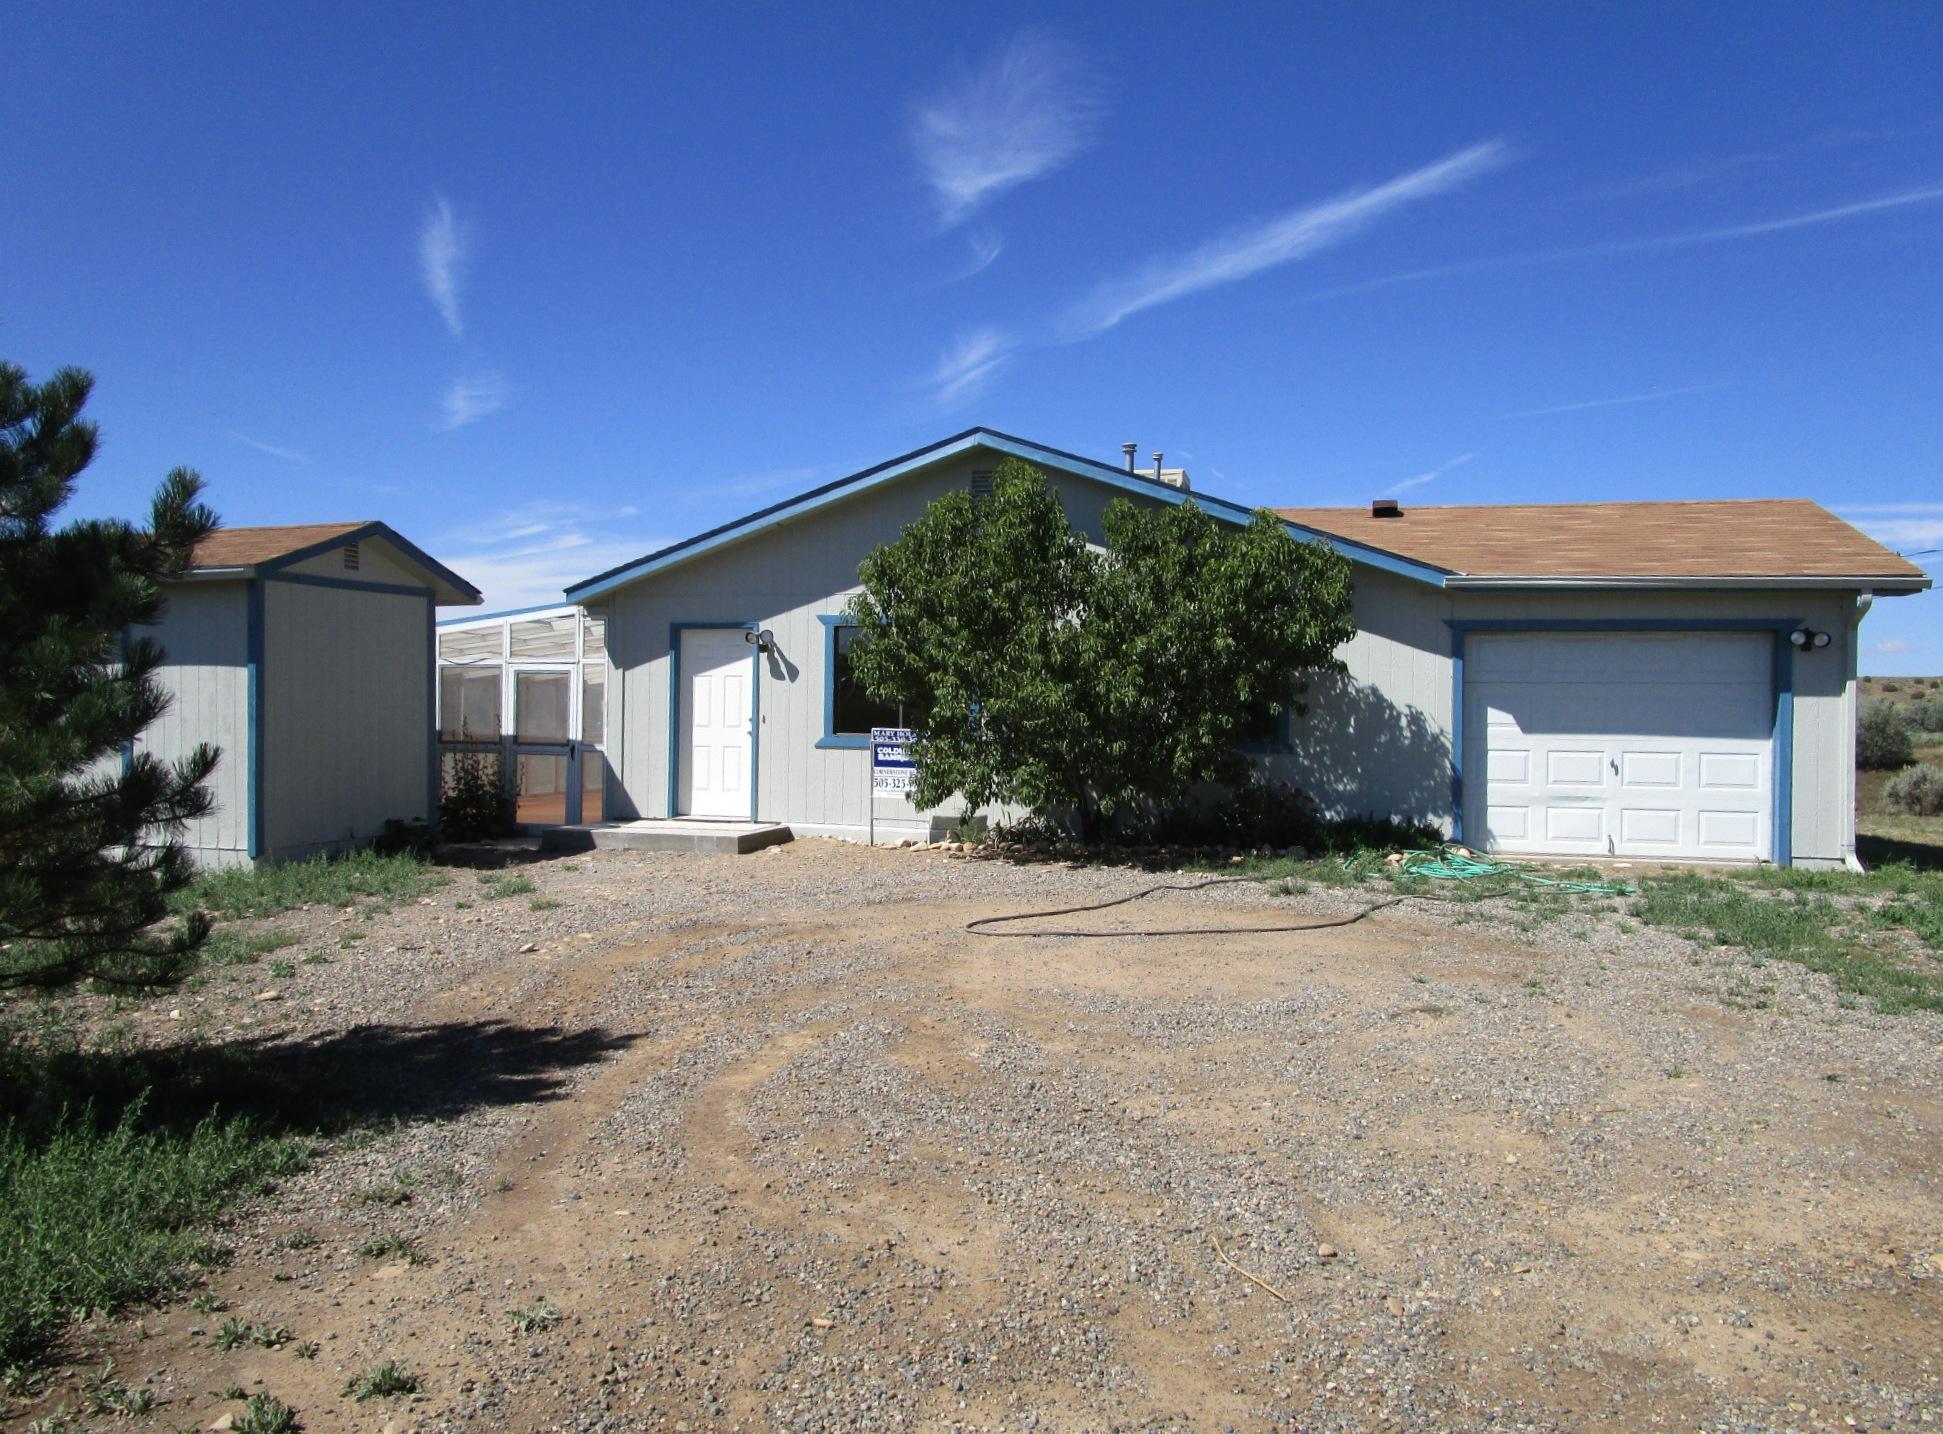 20 Road 1494, La Plata, New Mexico 87418